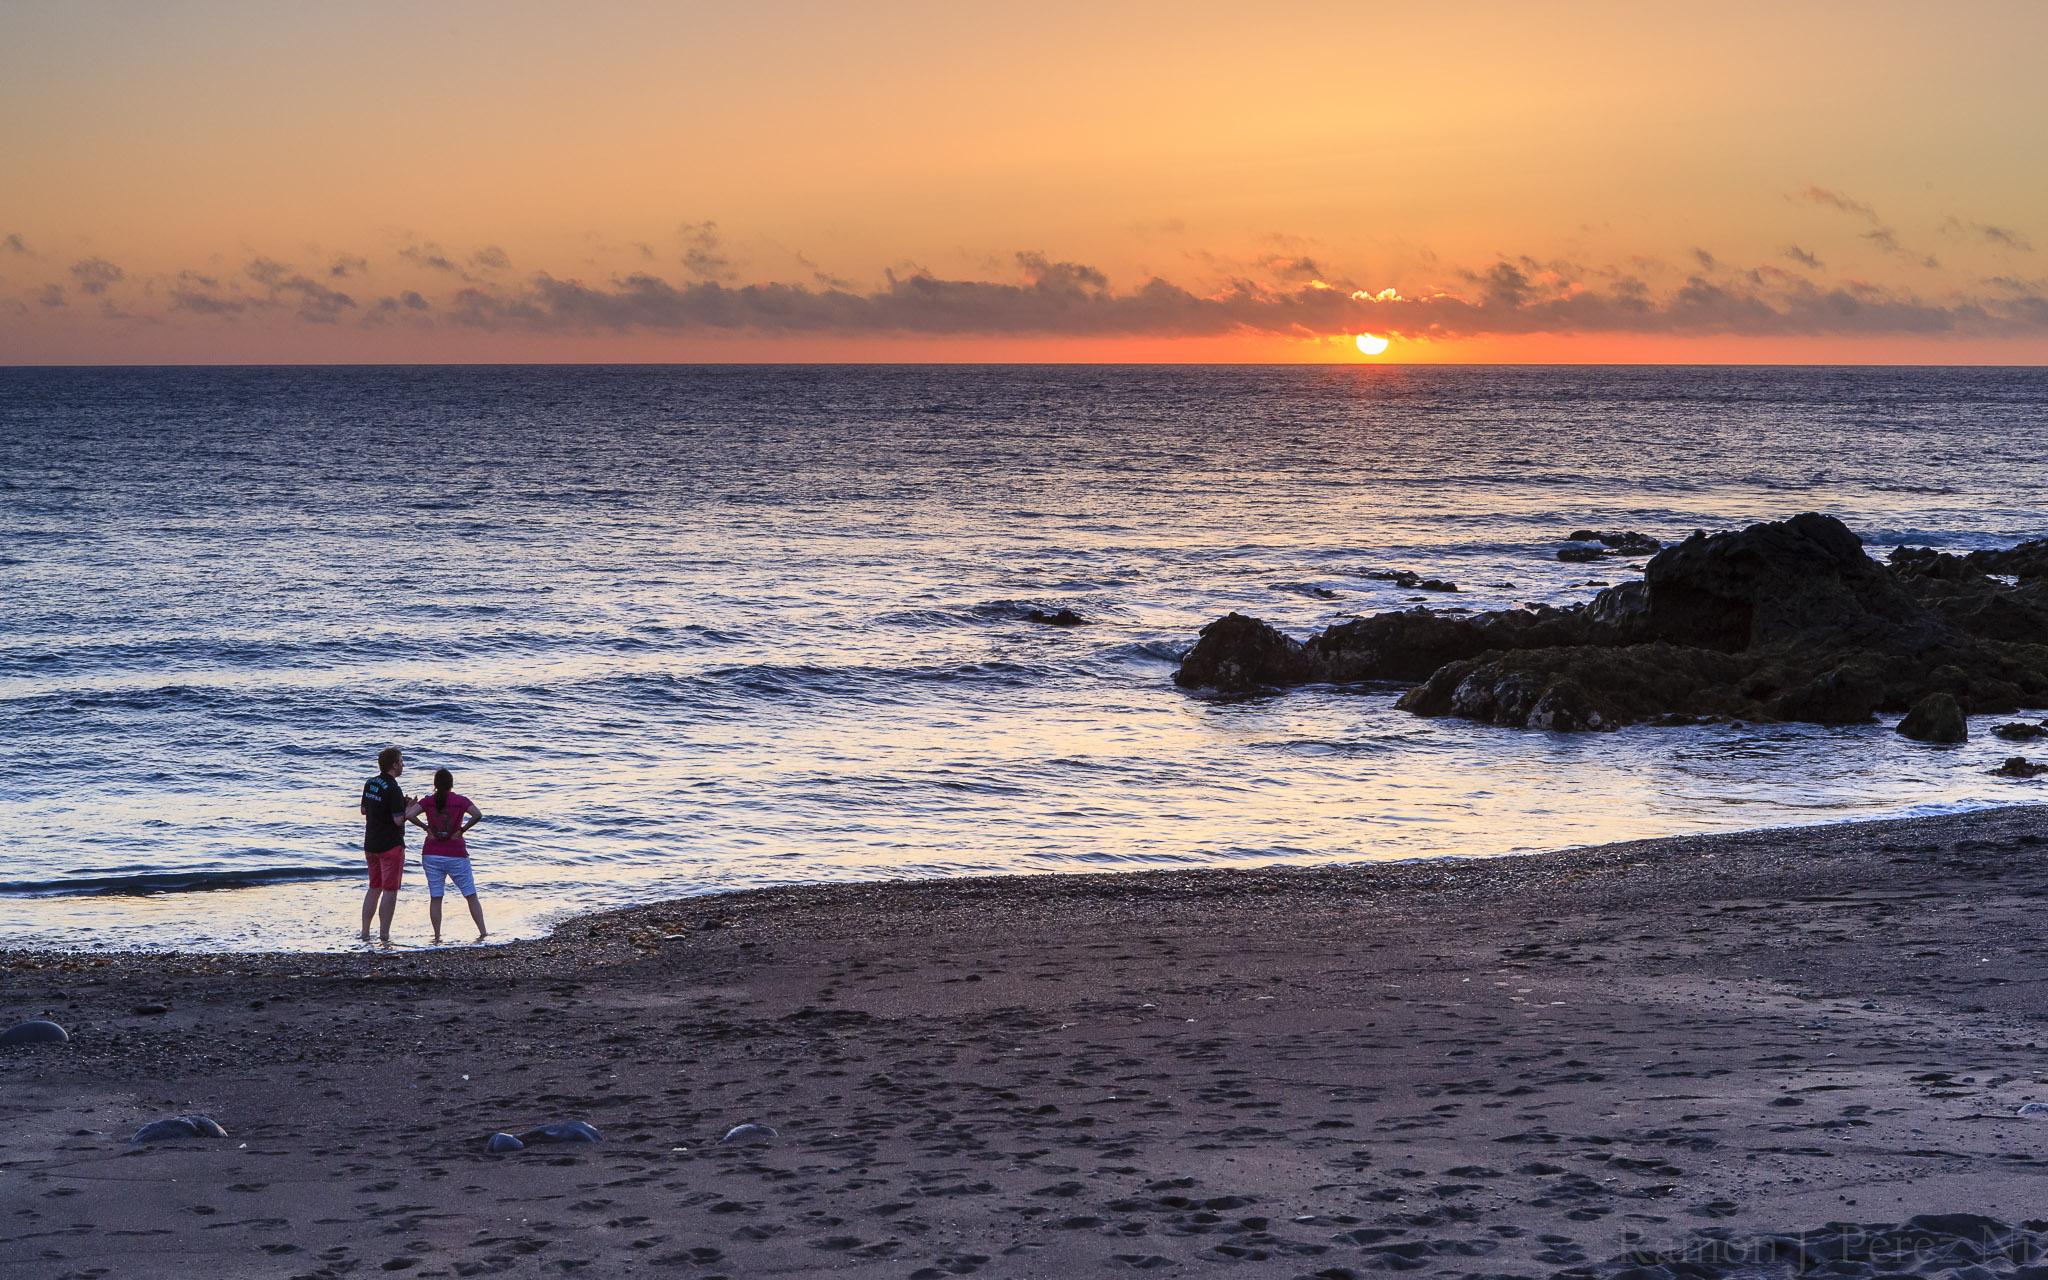 Foto de Ramón Pérez Niz, puesta de sol